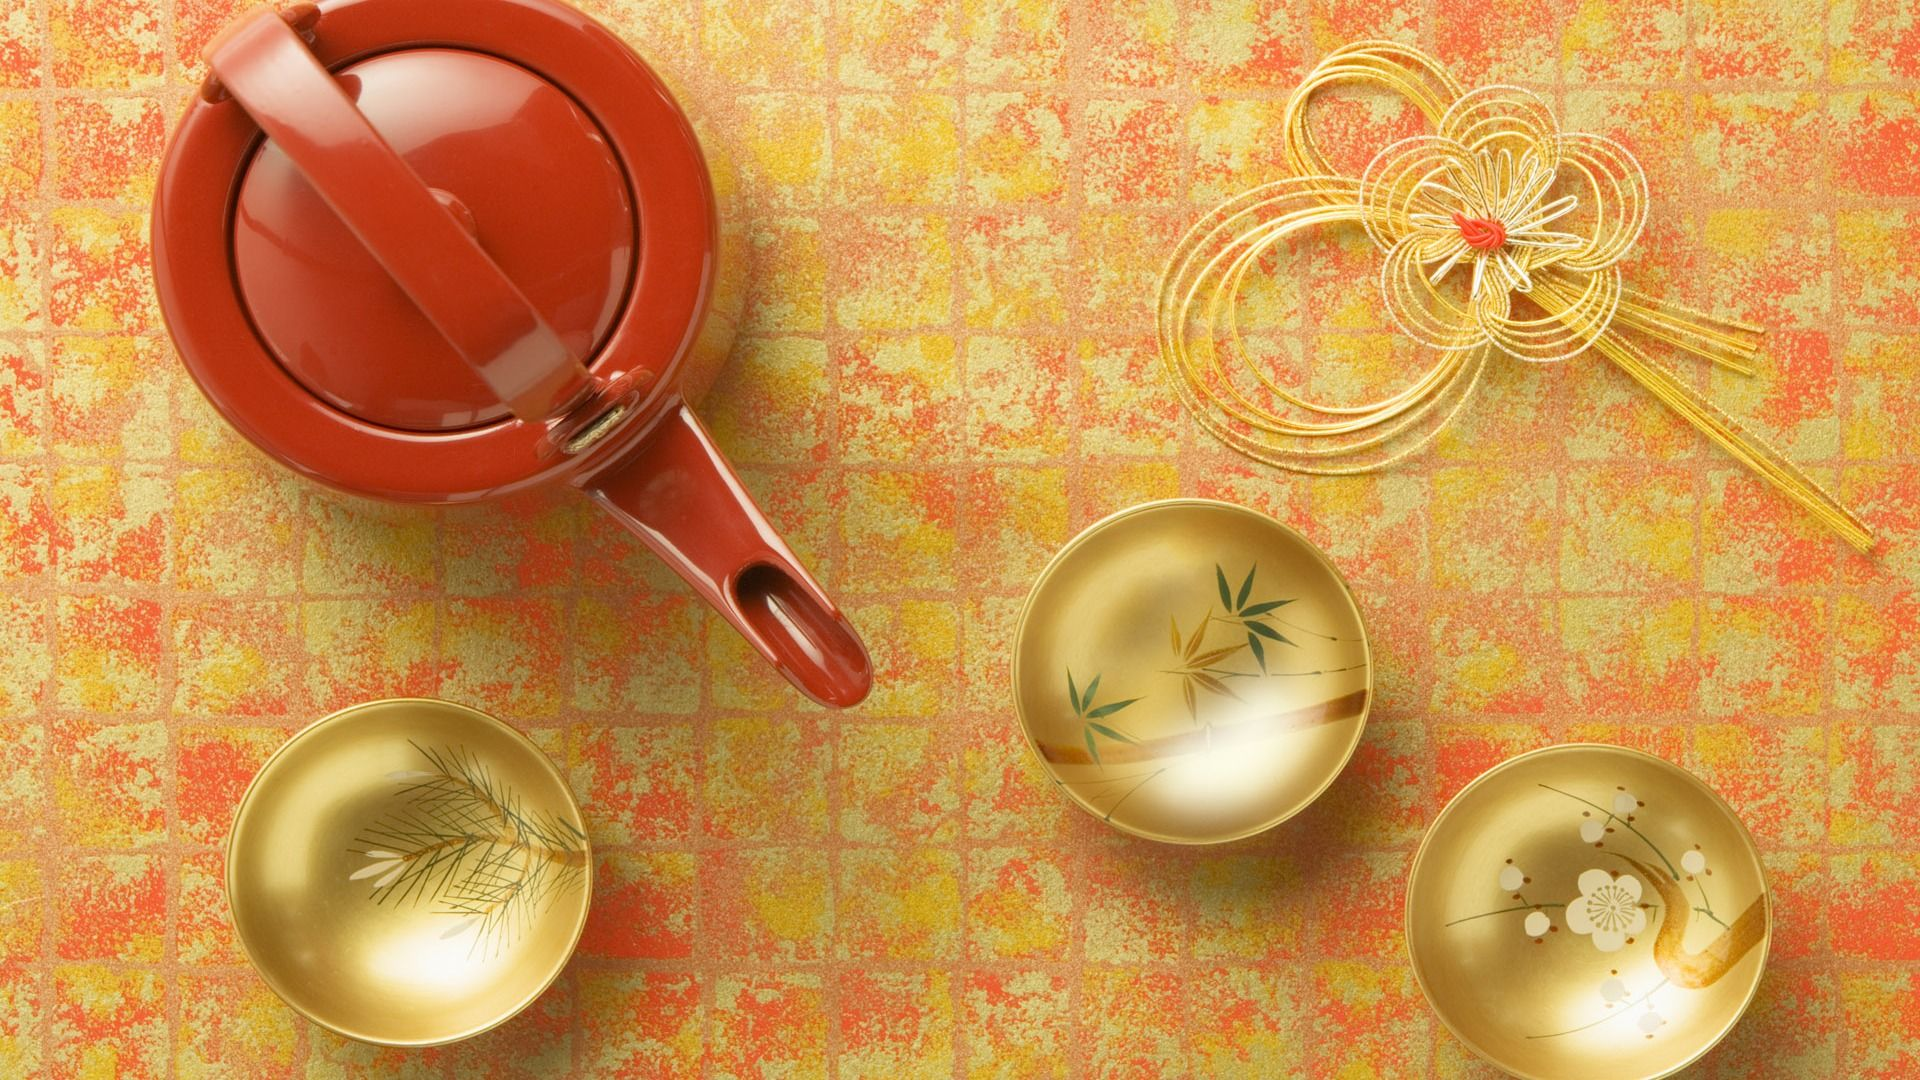 Japanese New Year HD Desktop Wallpaper